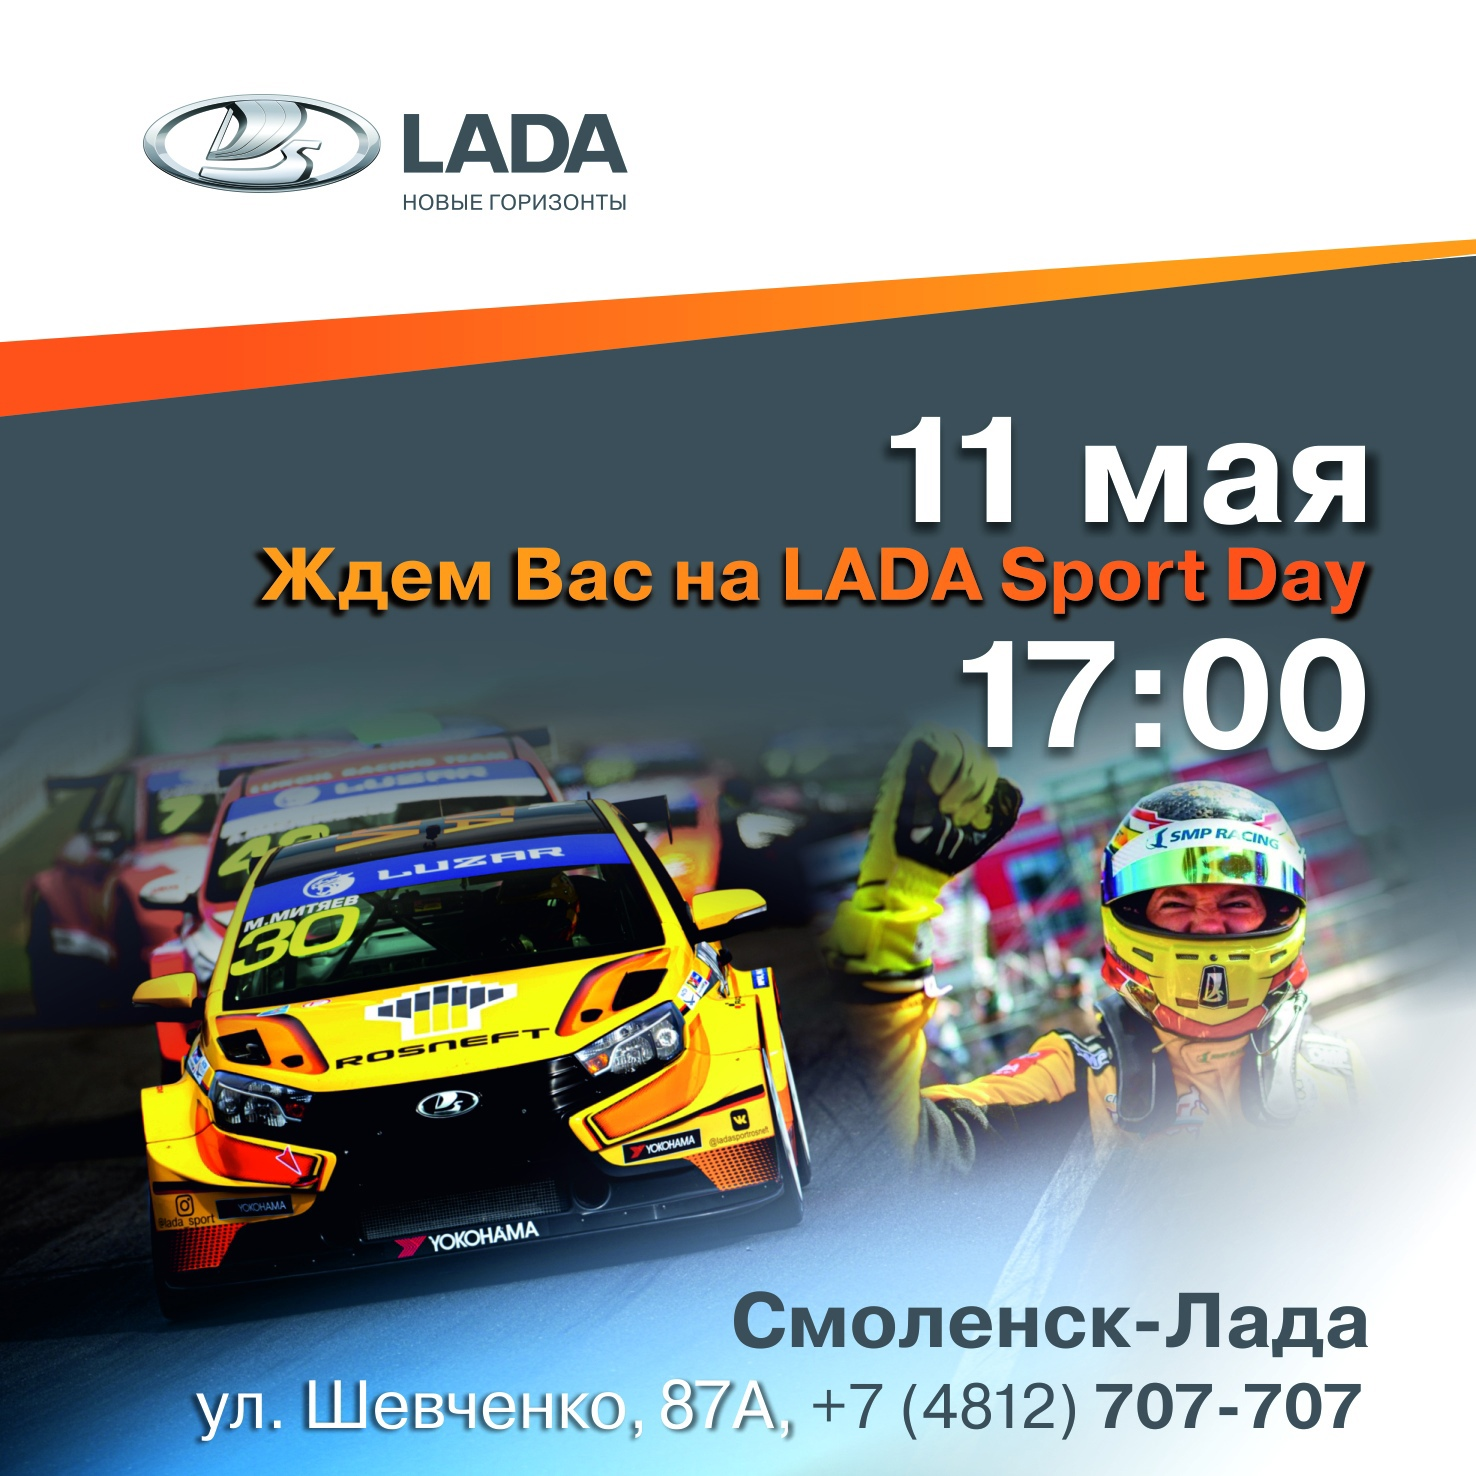 LADA Sport Day